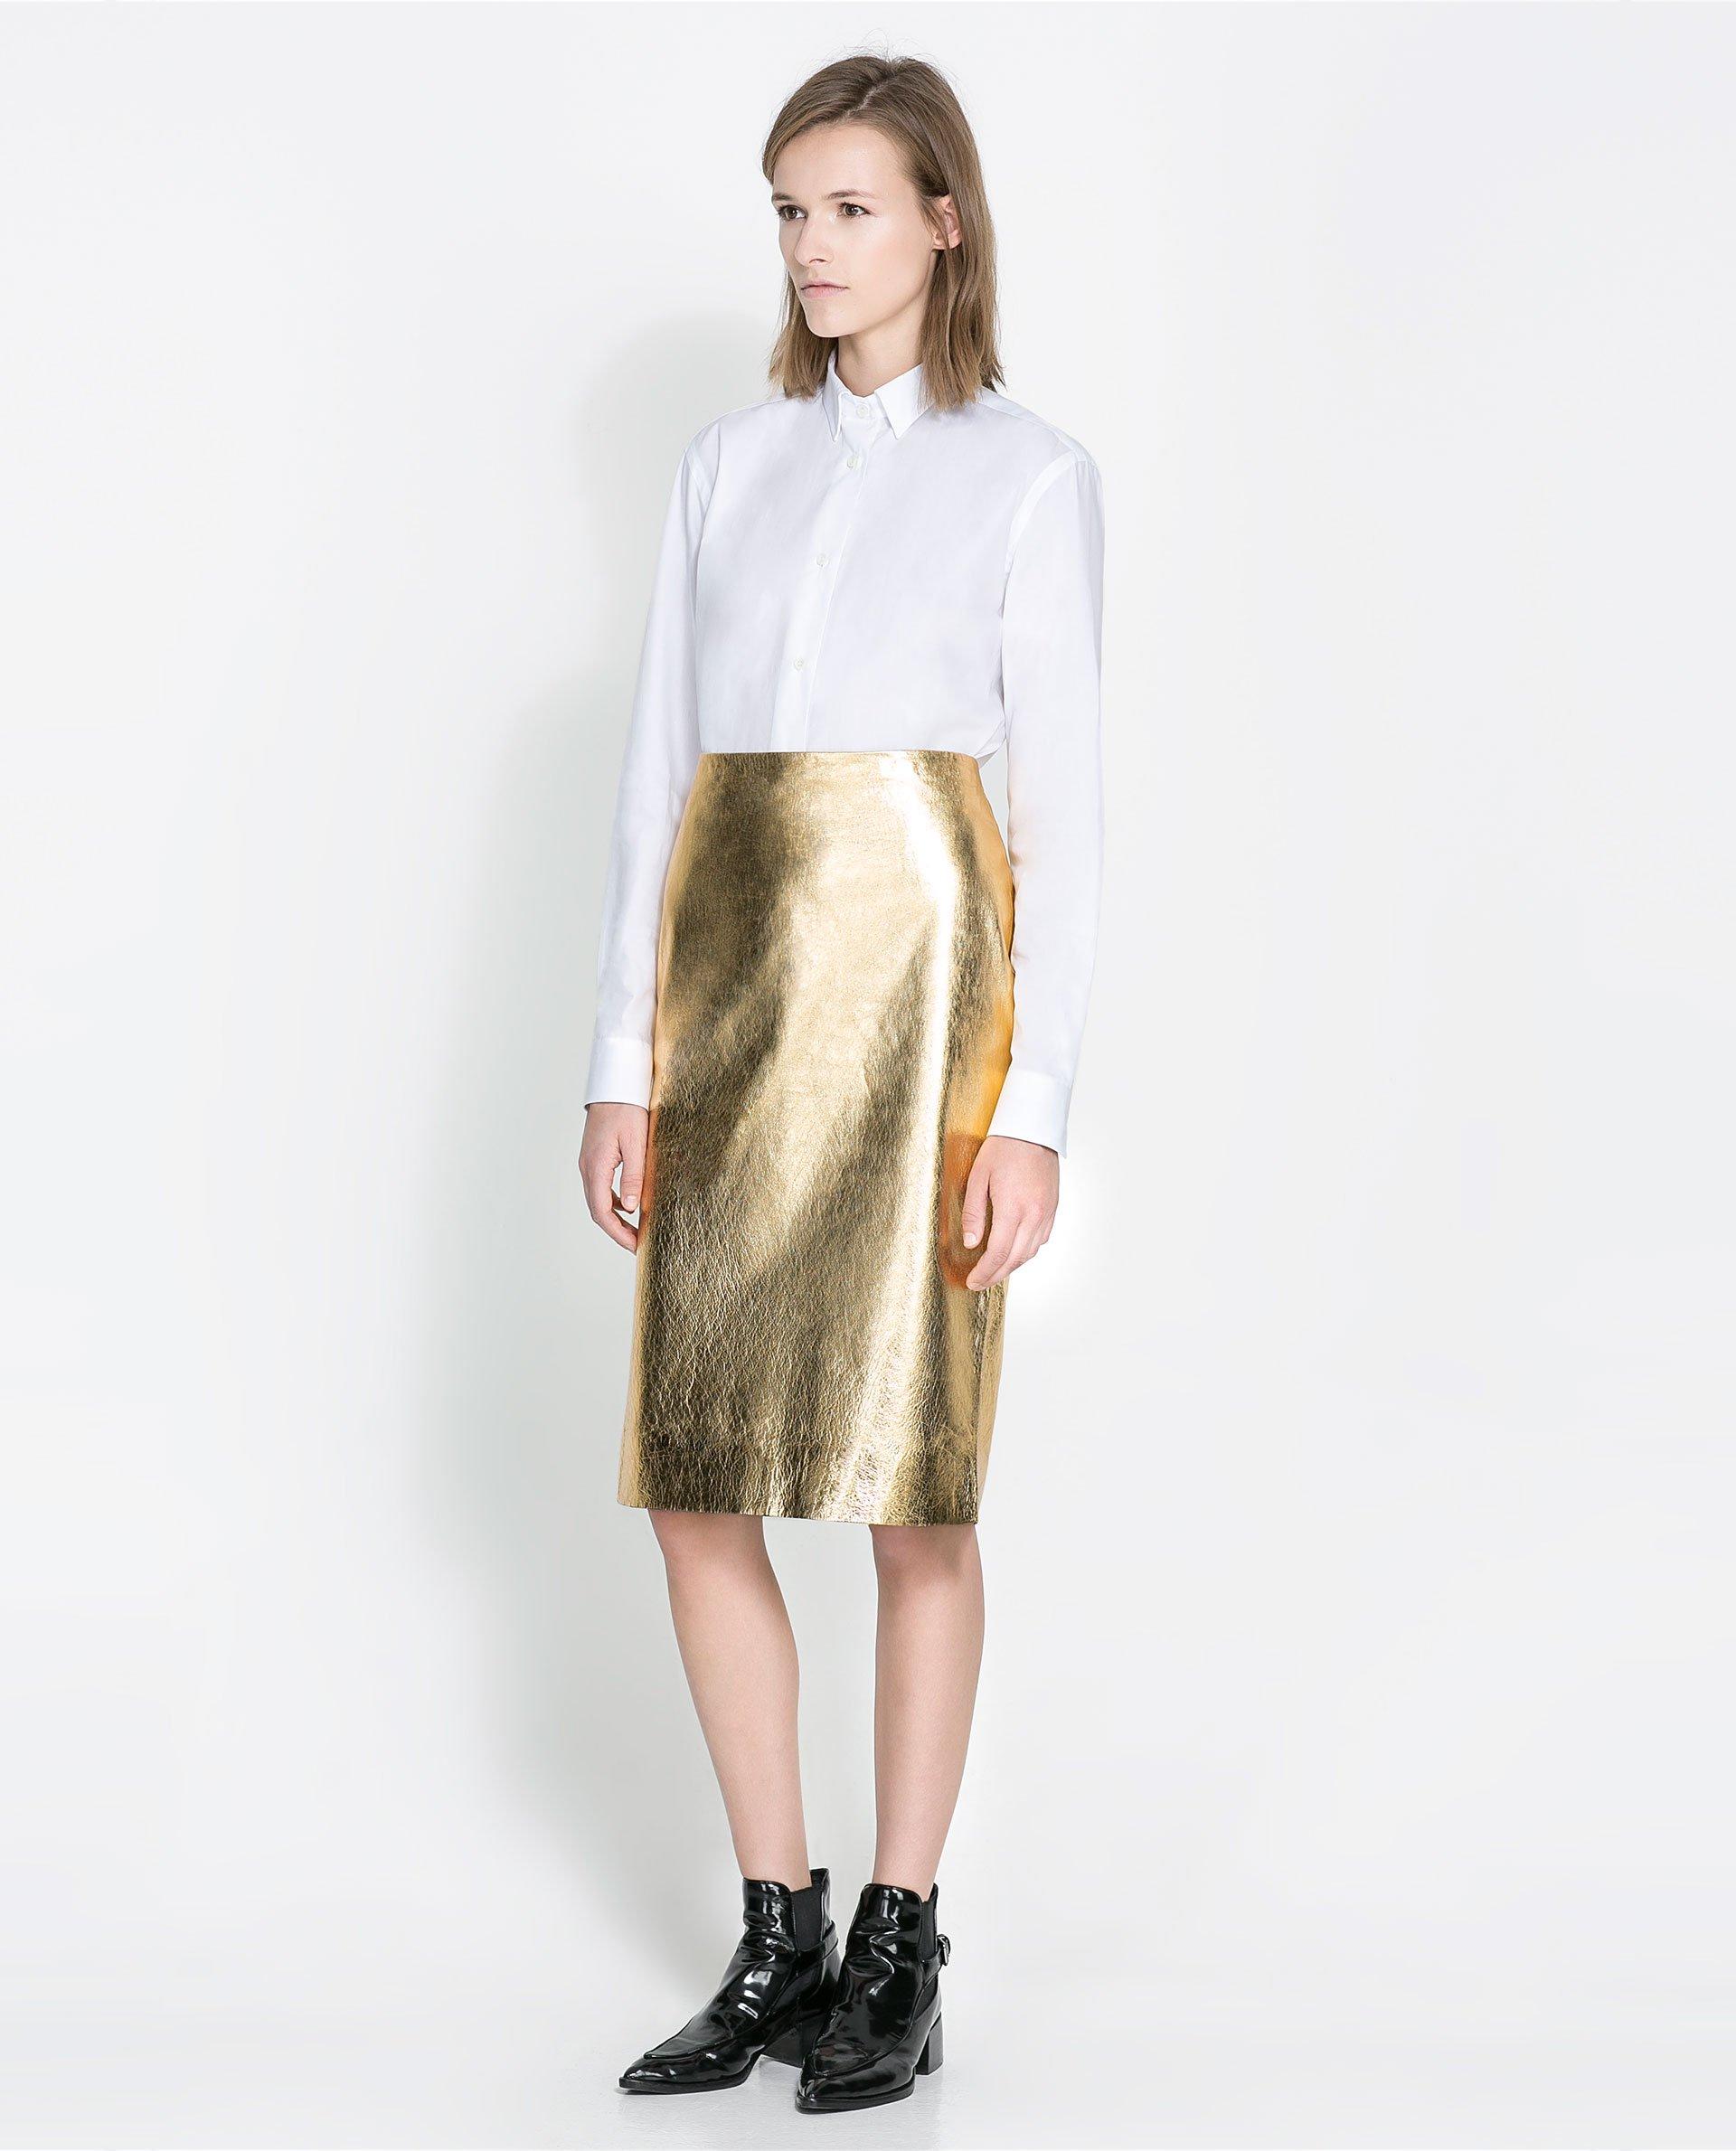 Zara Metallic Leather Skirt in Metallic | Lyst